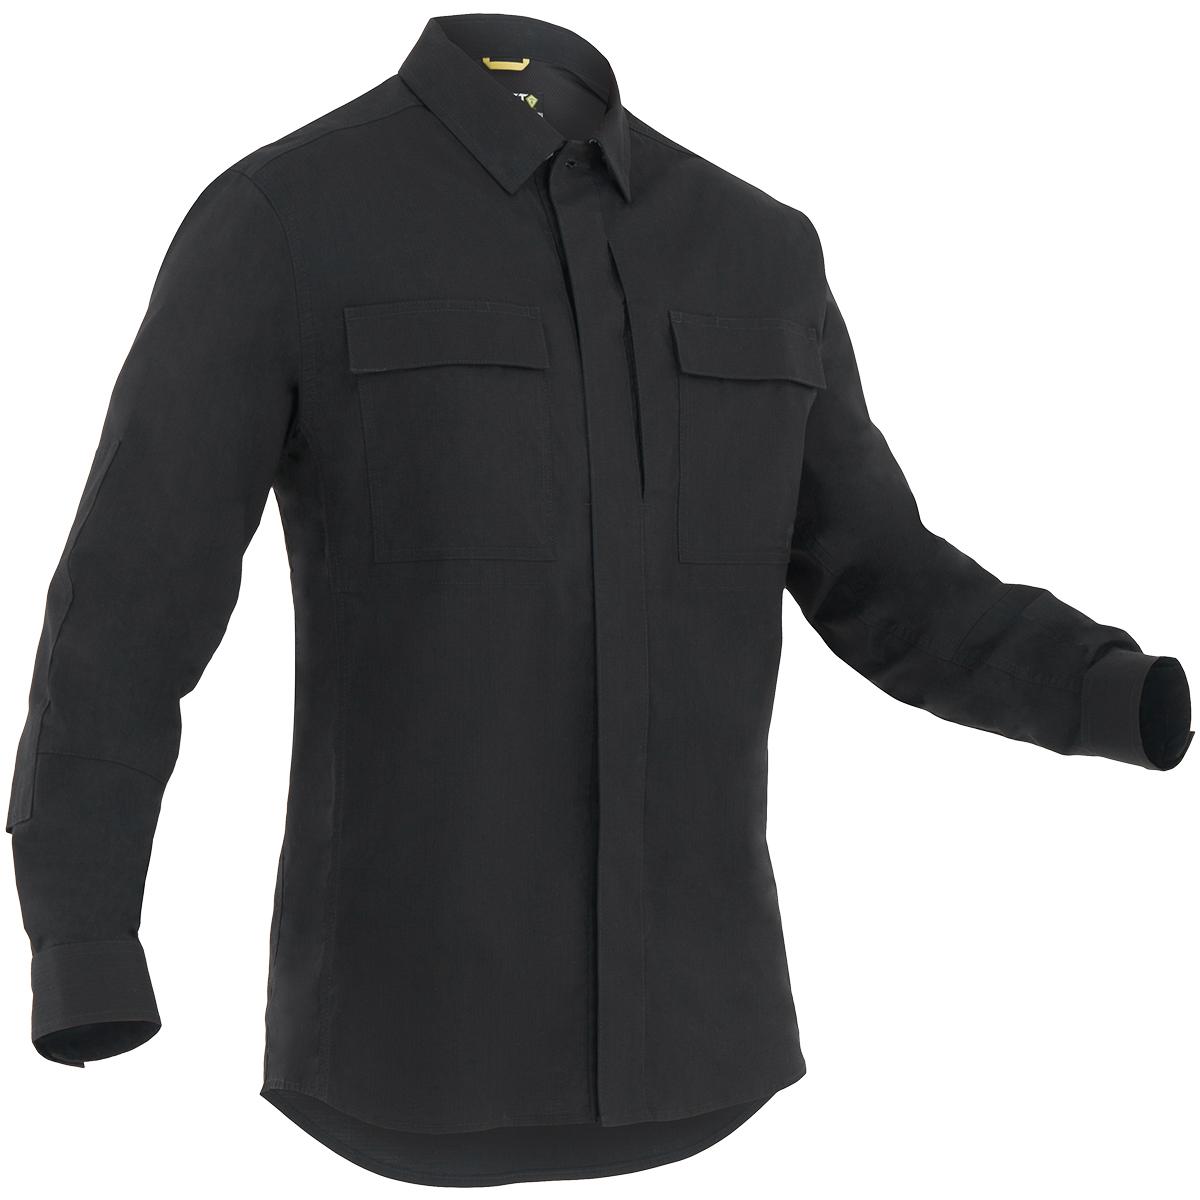 bd5c7232bea Sentinel First Tactical Tactix Hombres Manga Larga Bdu Camiseta Policía  Seguridad Negro